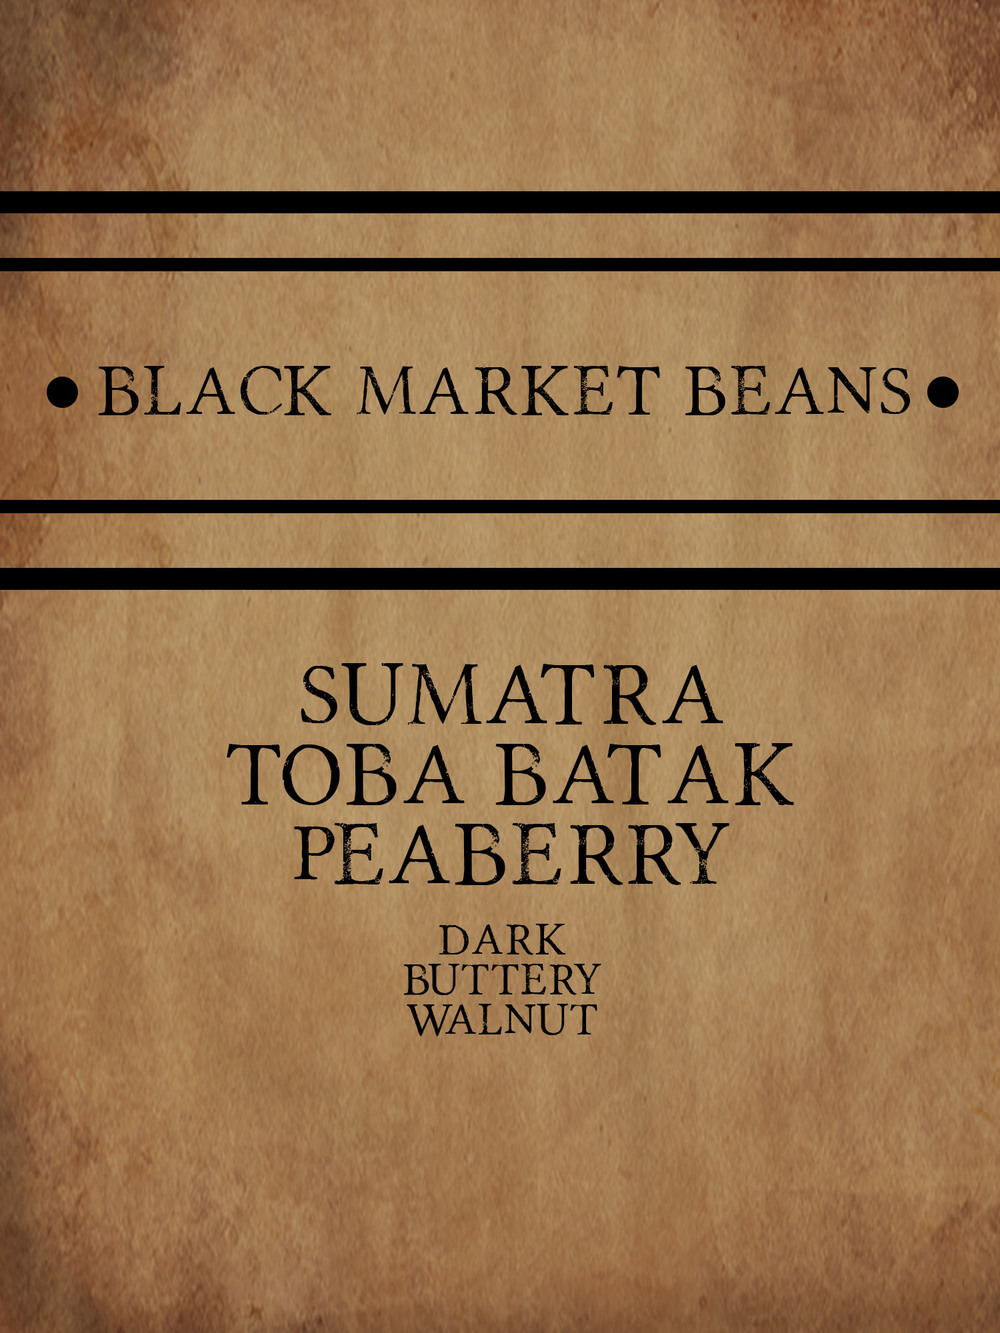 coffee_Sumatra_Toba_Batak_Peaberry.jpg